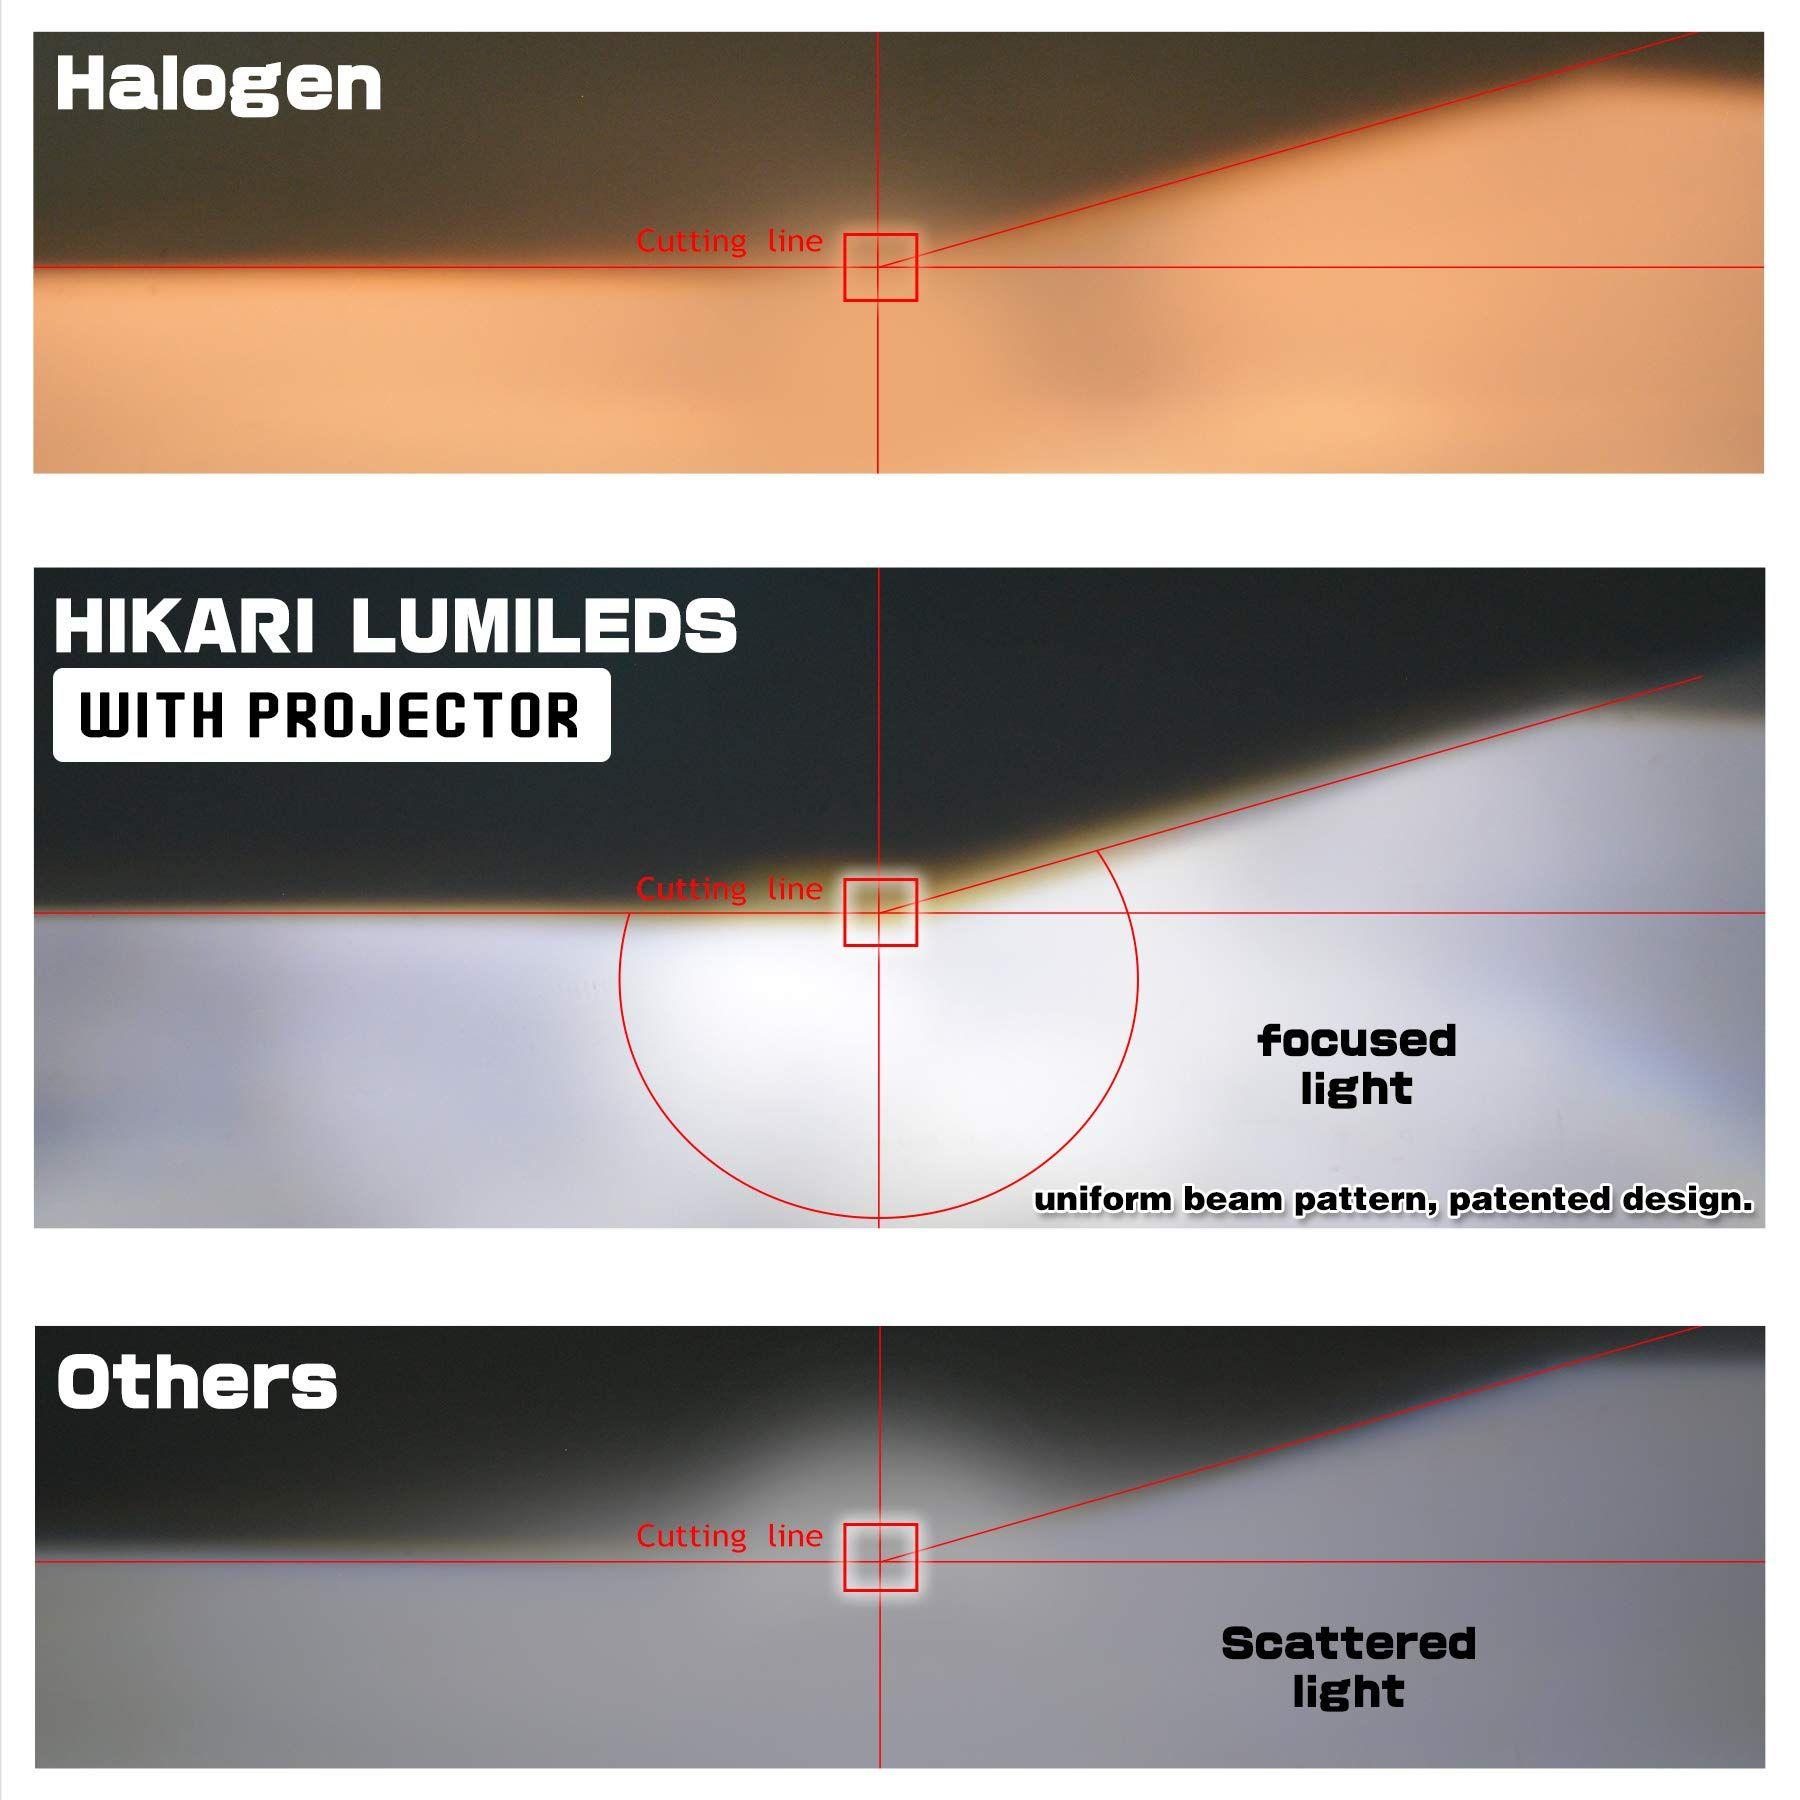 Hikari Ultra Led Headlight Bulbs Conversion Kit H13 9008 Prime Led 12000lm 6k Cool White 2 Yr Warranty Ad Conver Led Headlights Headlight Bulbs Headlights